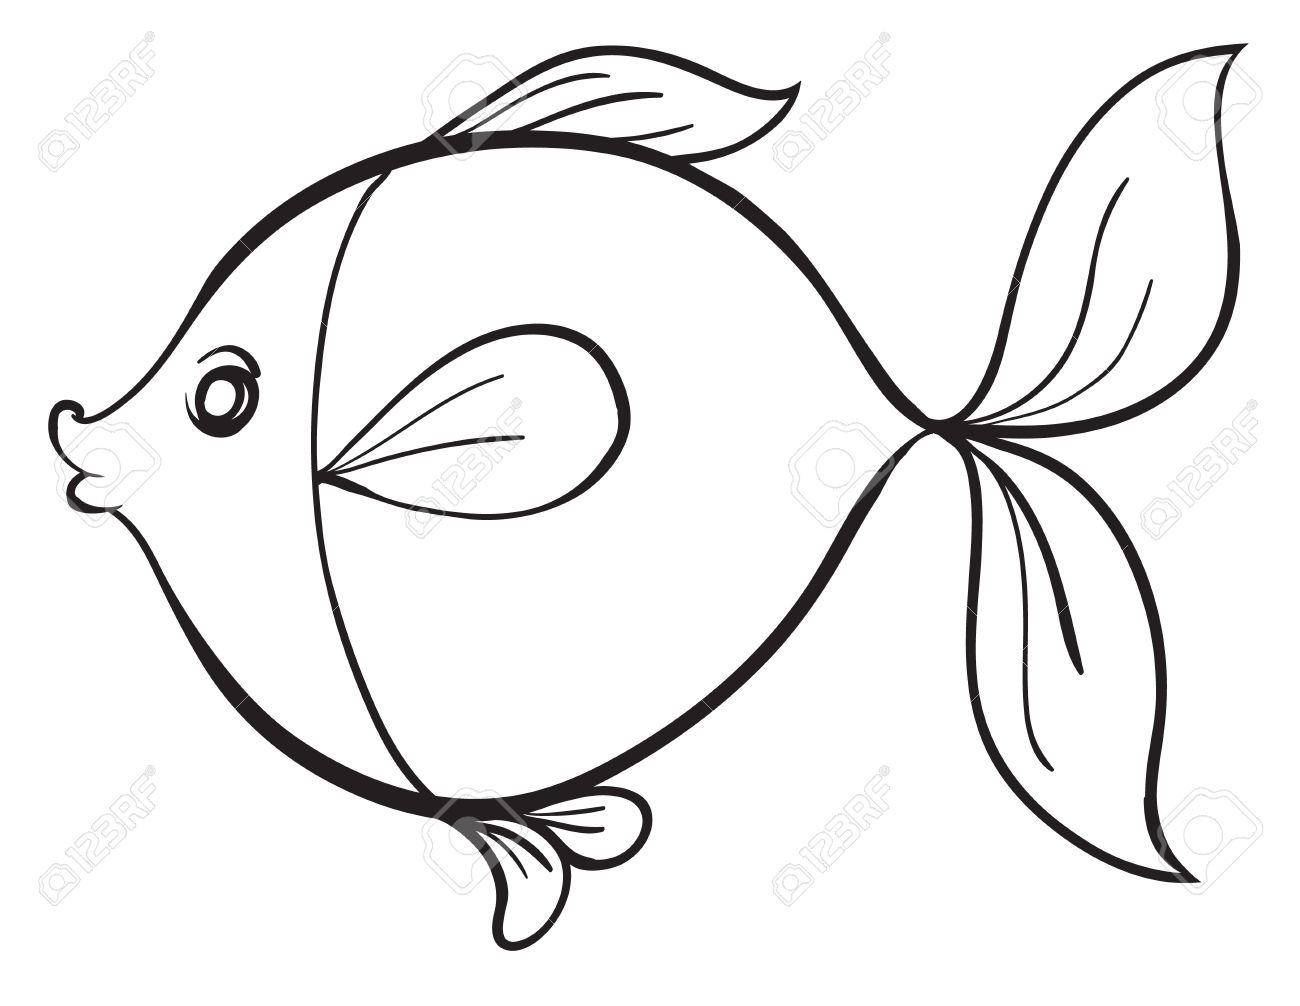 Fish Line Drawing At Getdrawings